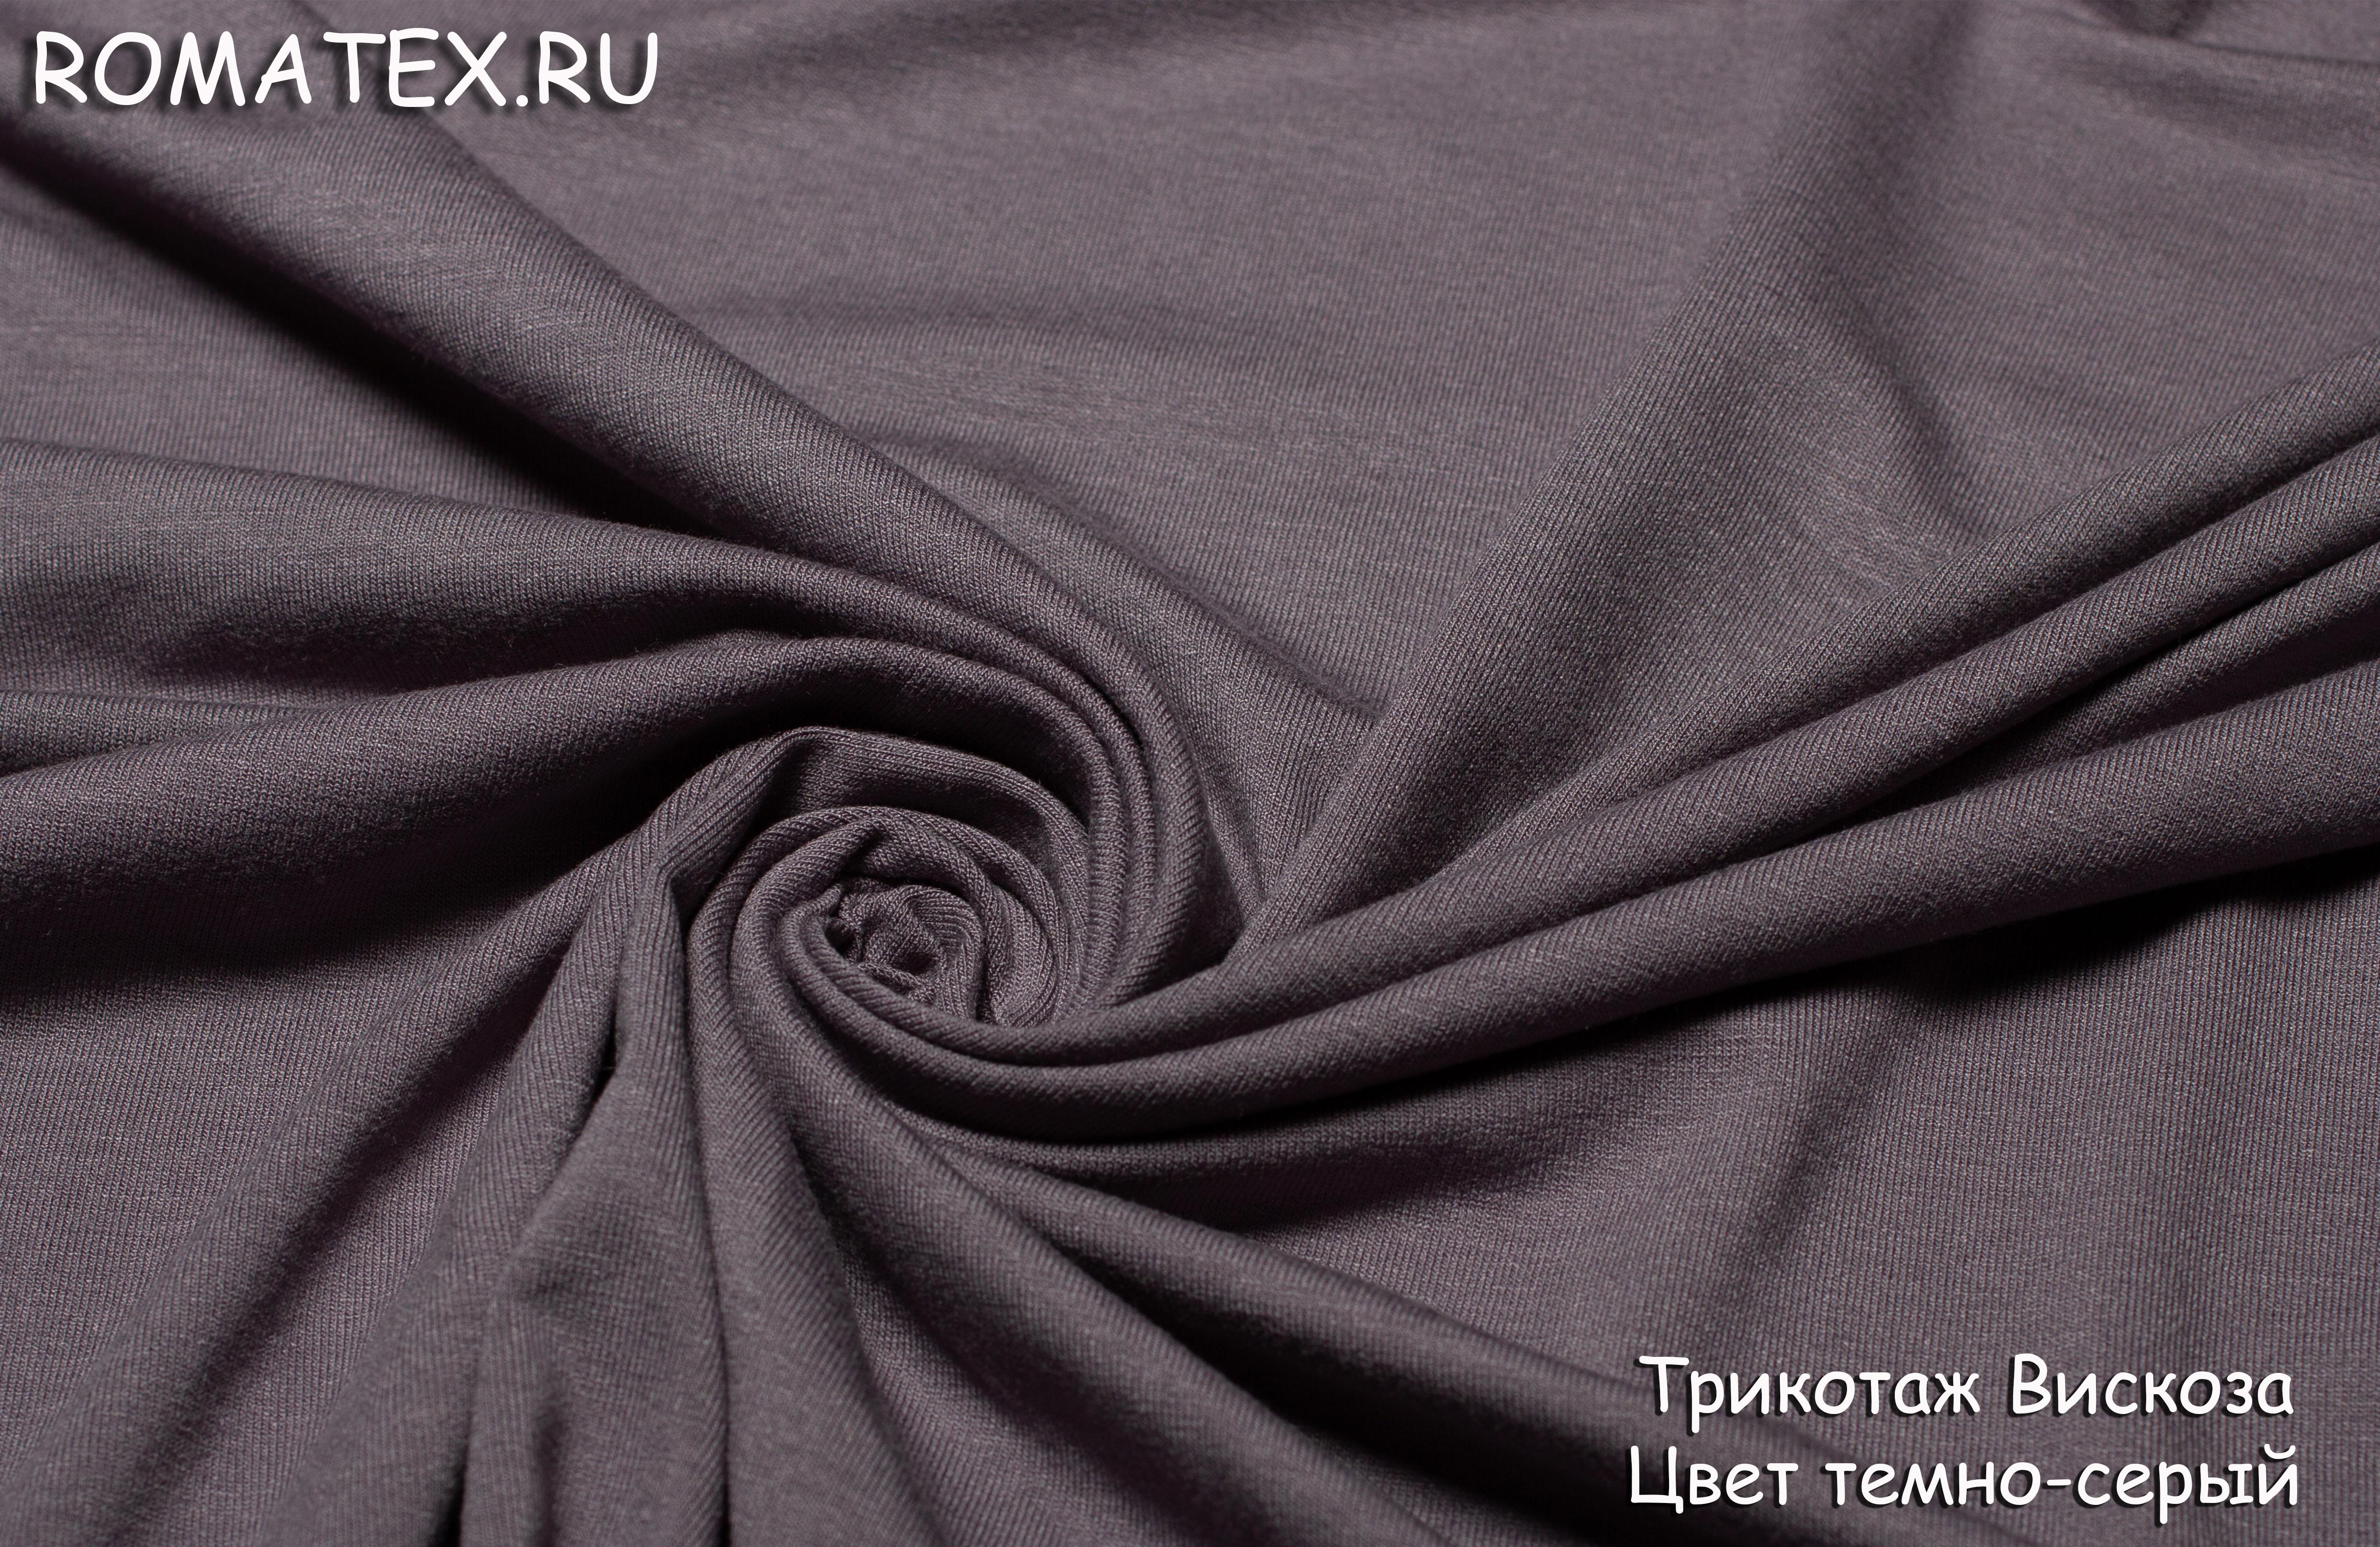 Трикотаж вискоза цвет темно-серый